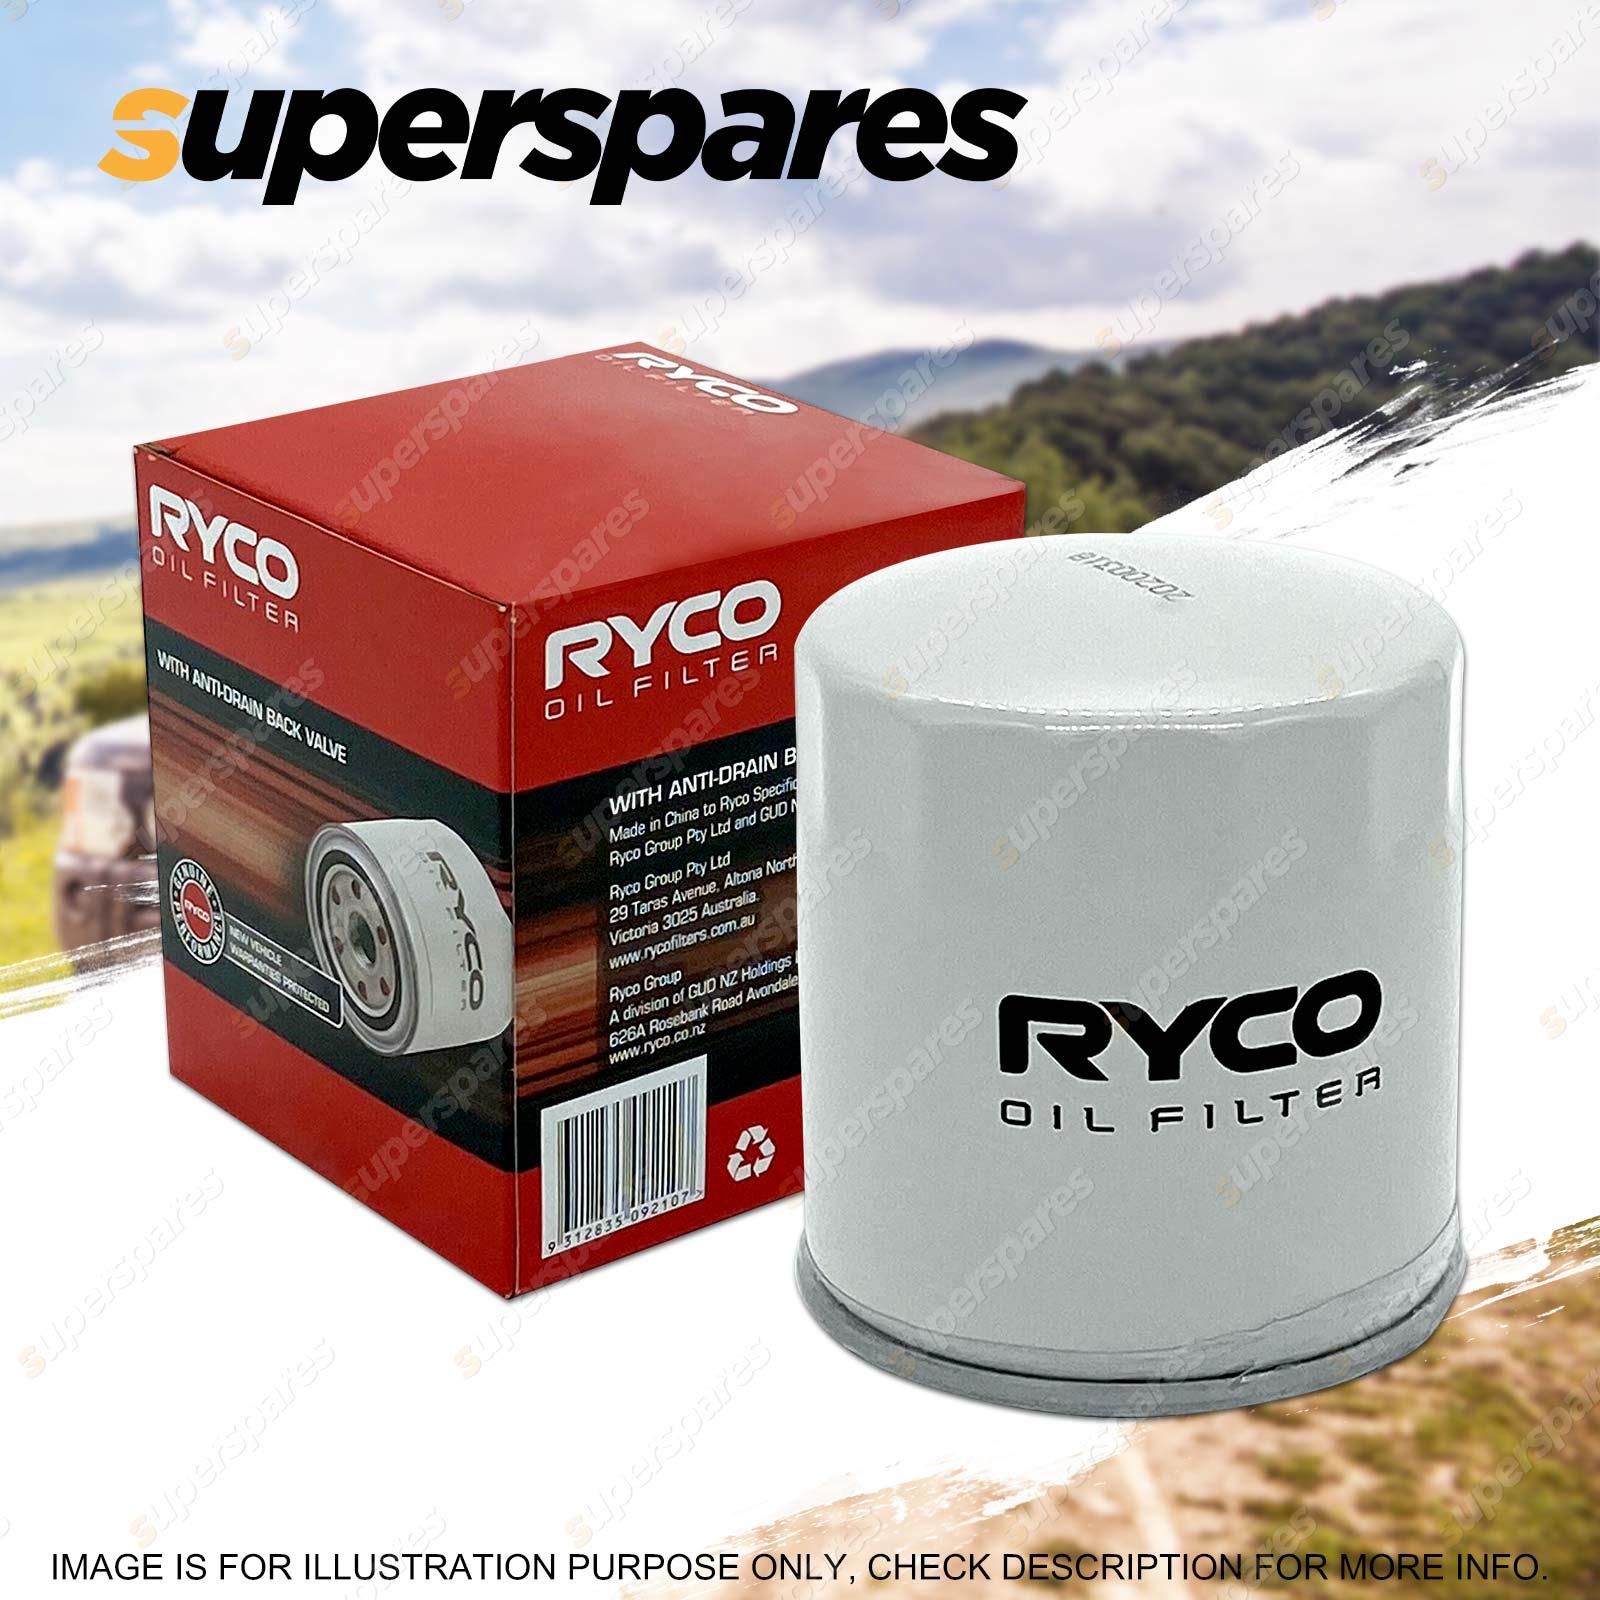 hight resolution of ryco oil filter for jeep cherokee kj xj wrangler mazda cx 9 tb series 5 tribute